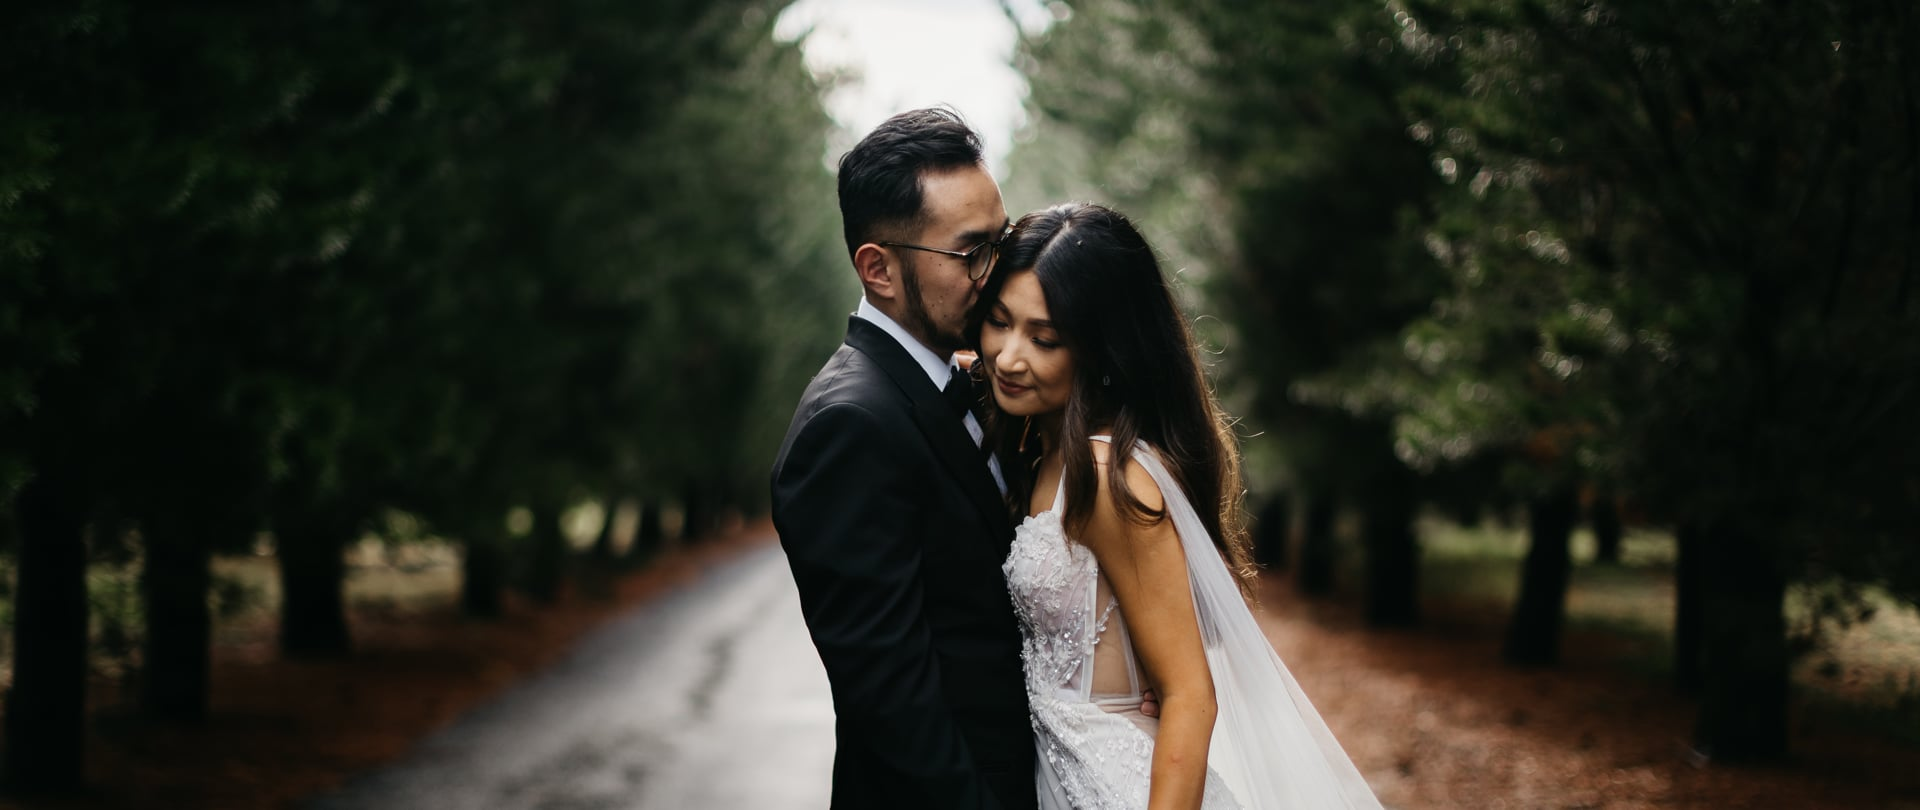 Toni & Jim Wedding Video Filmed at Melbourne, Victoria